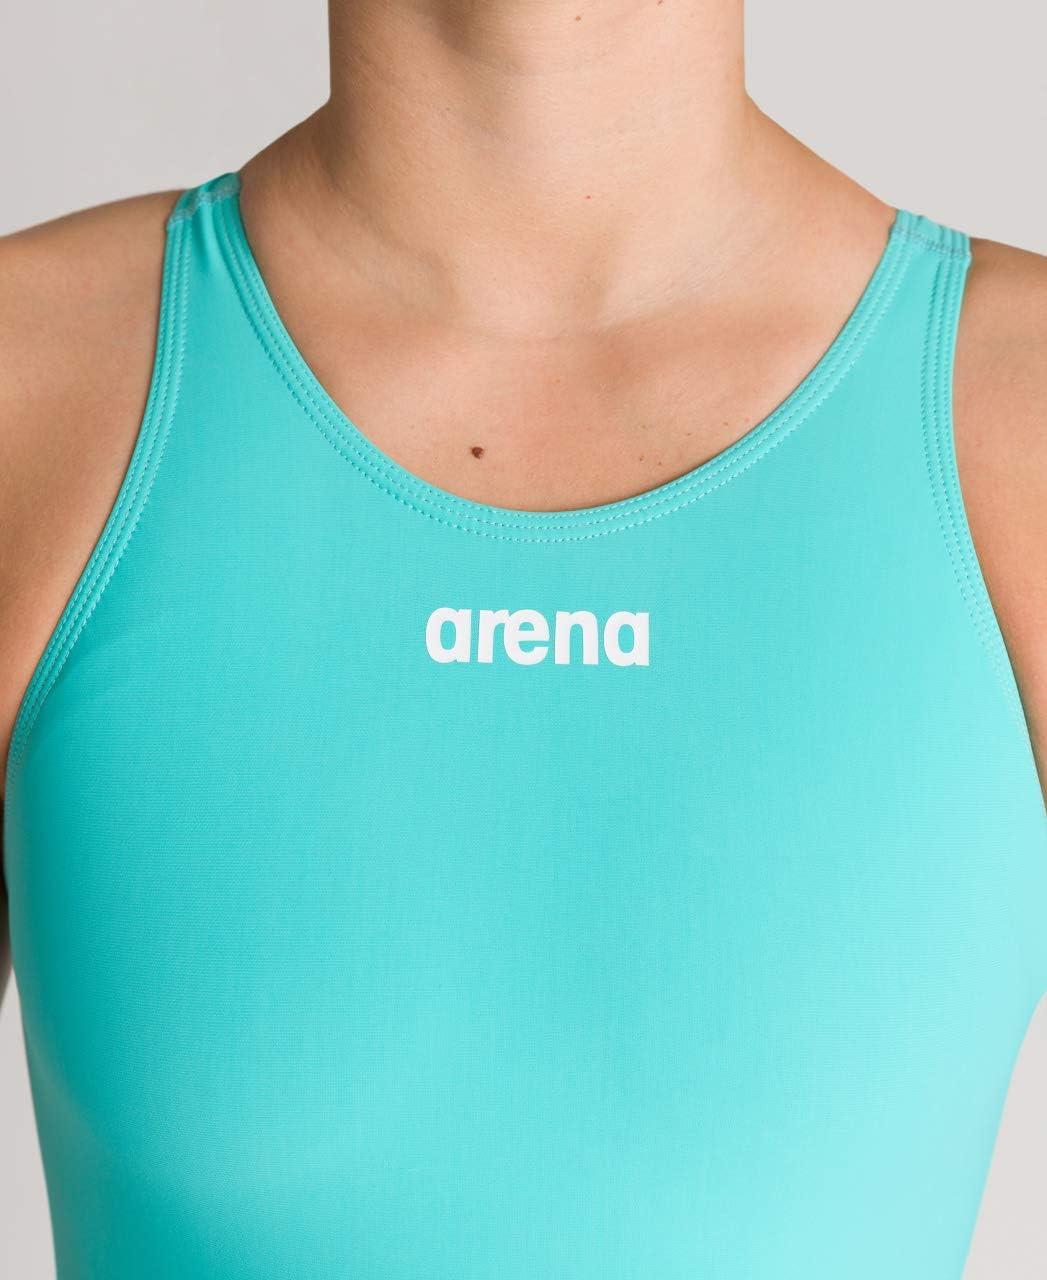 ARENA Powerskin St 2.0-Open Back Traje de ba/ño de una Pieza Mujer